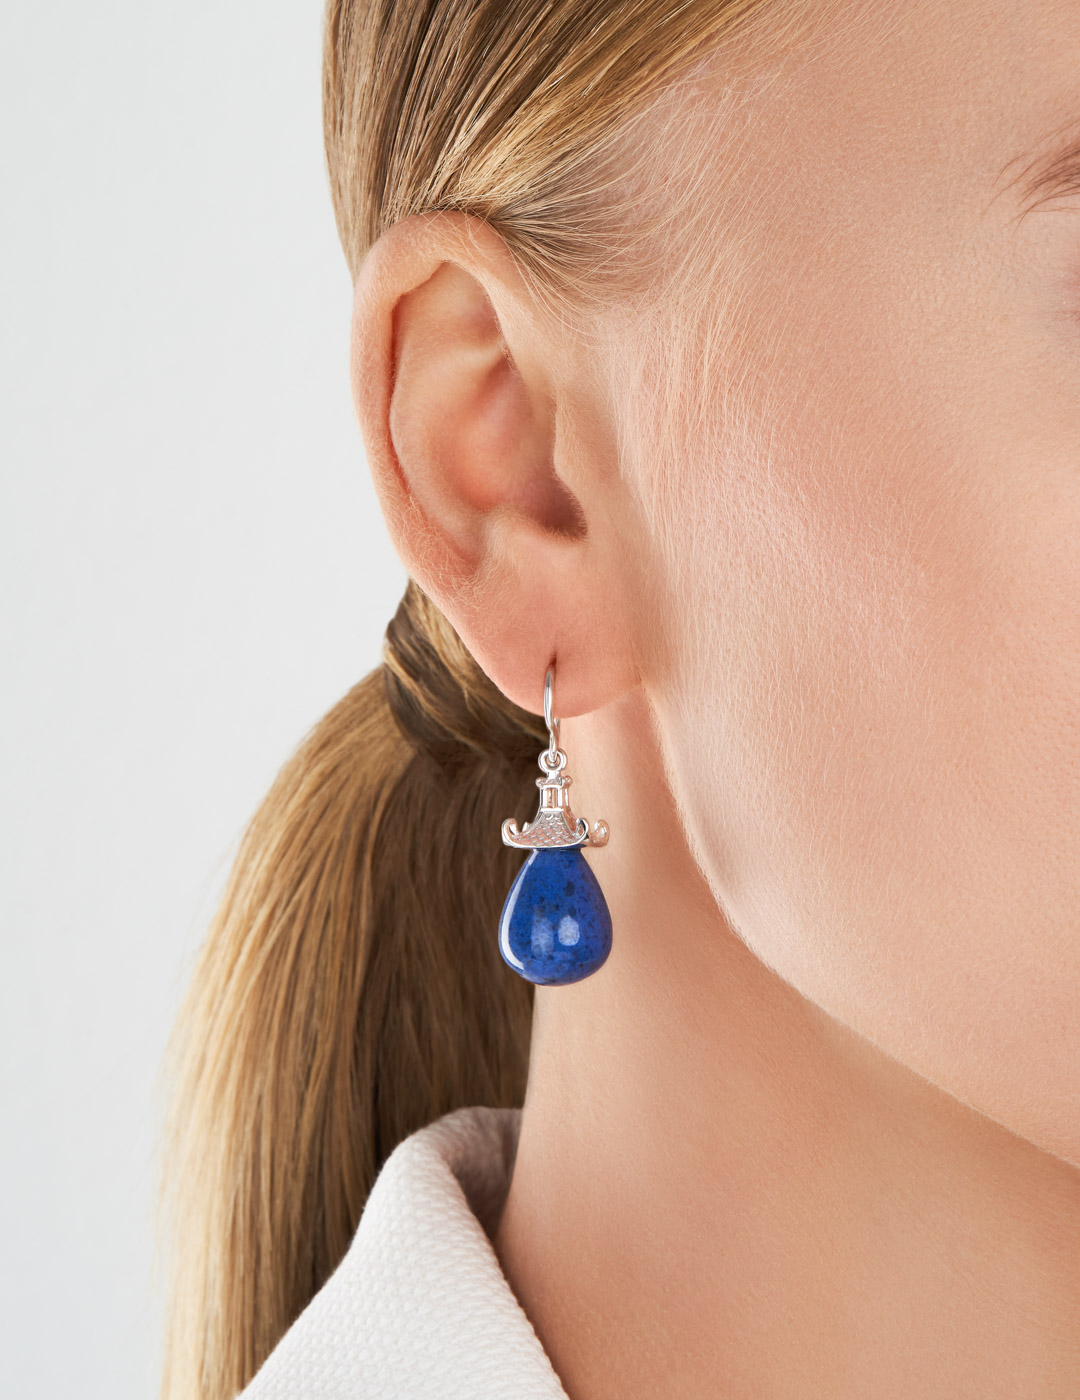 mish_products_earrings_Pagoda-Amazonite-ER-2